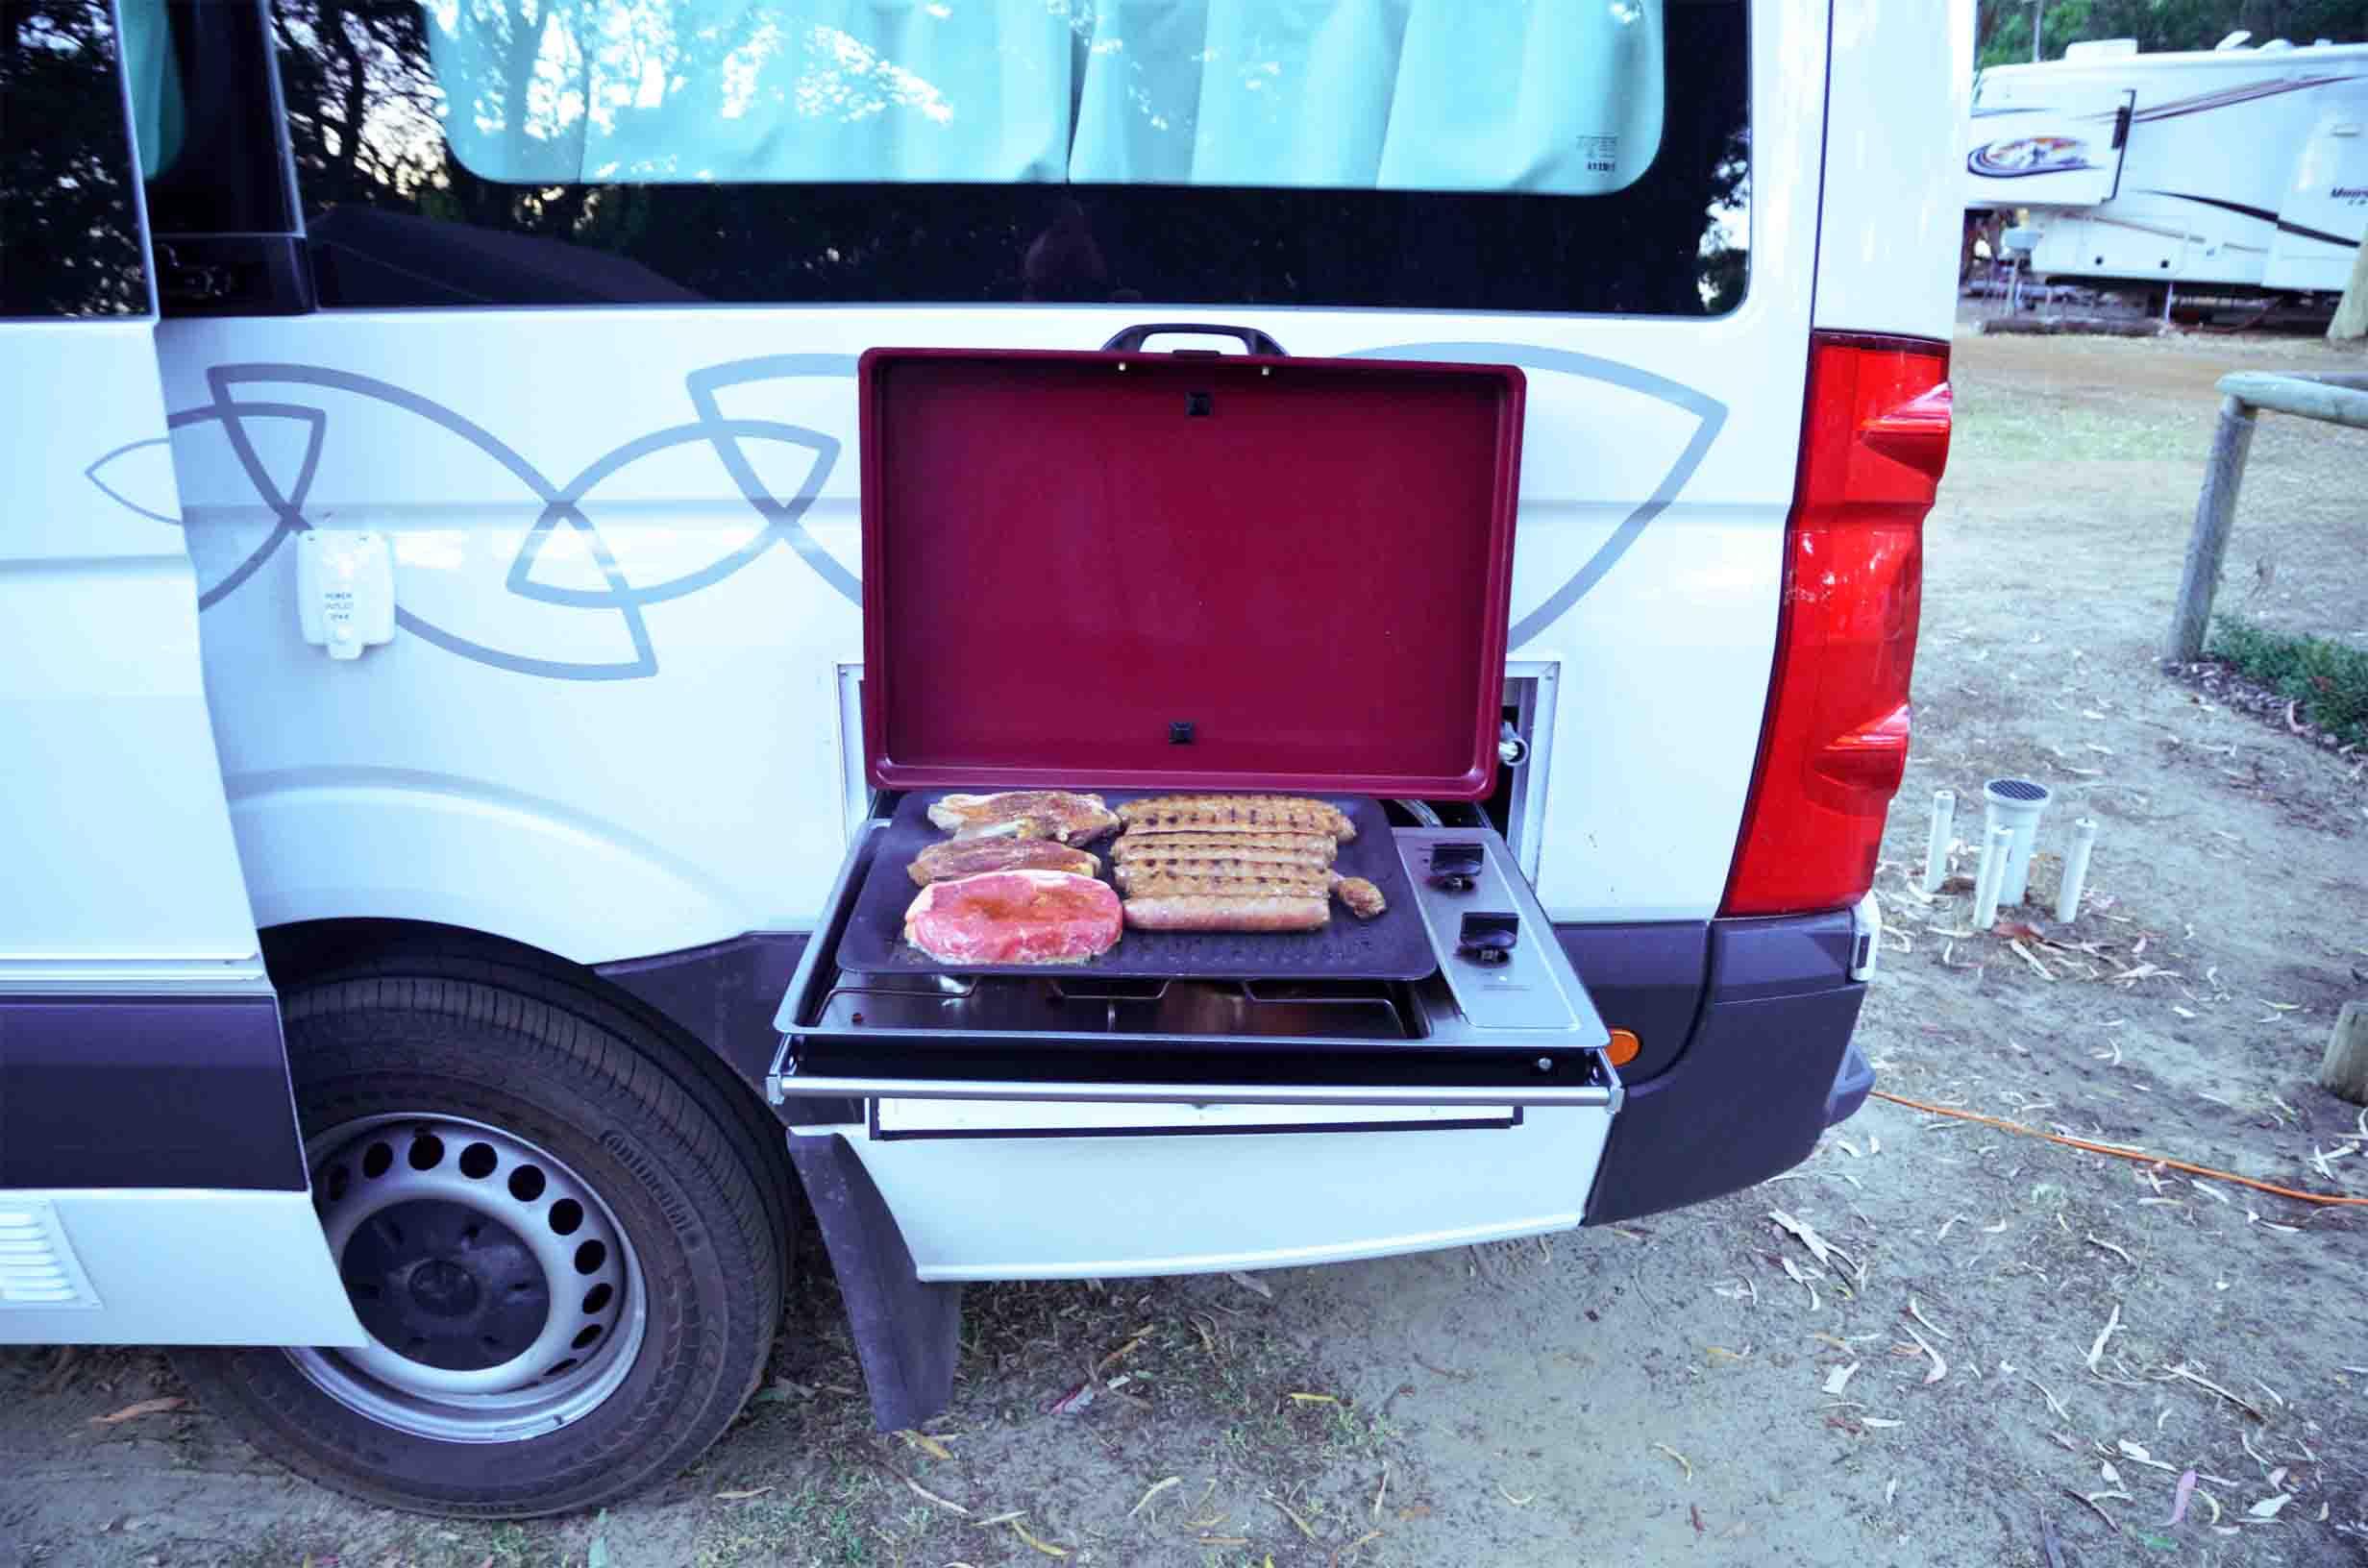 BBQ Grill am Wohnmobil